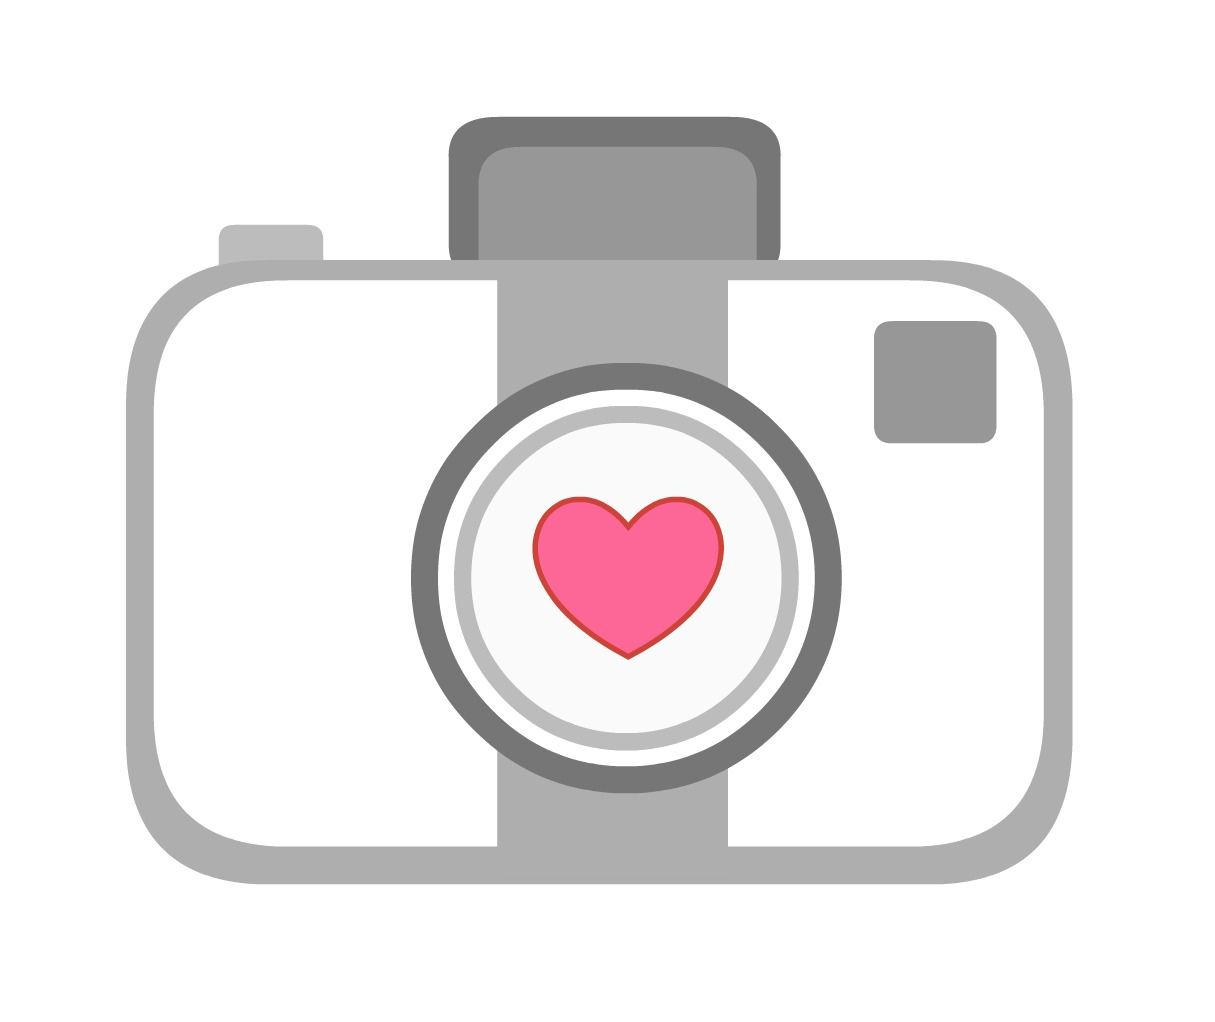 Pin Em Camera Love